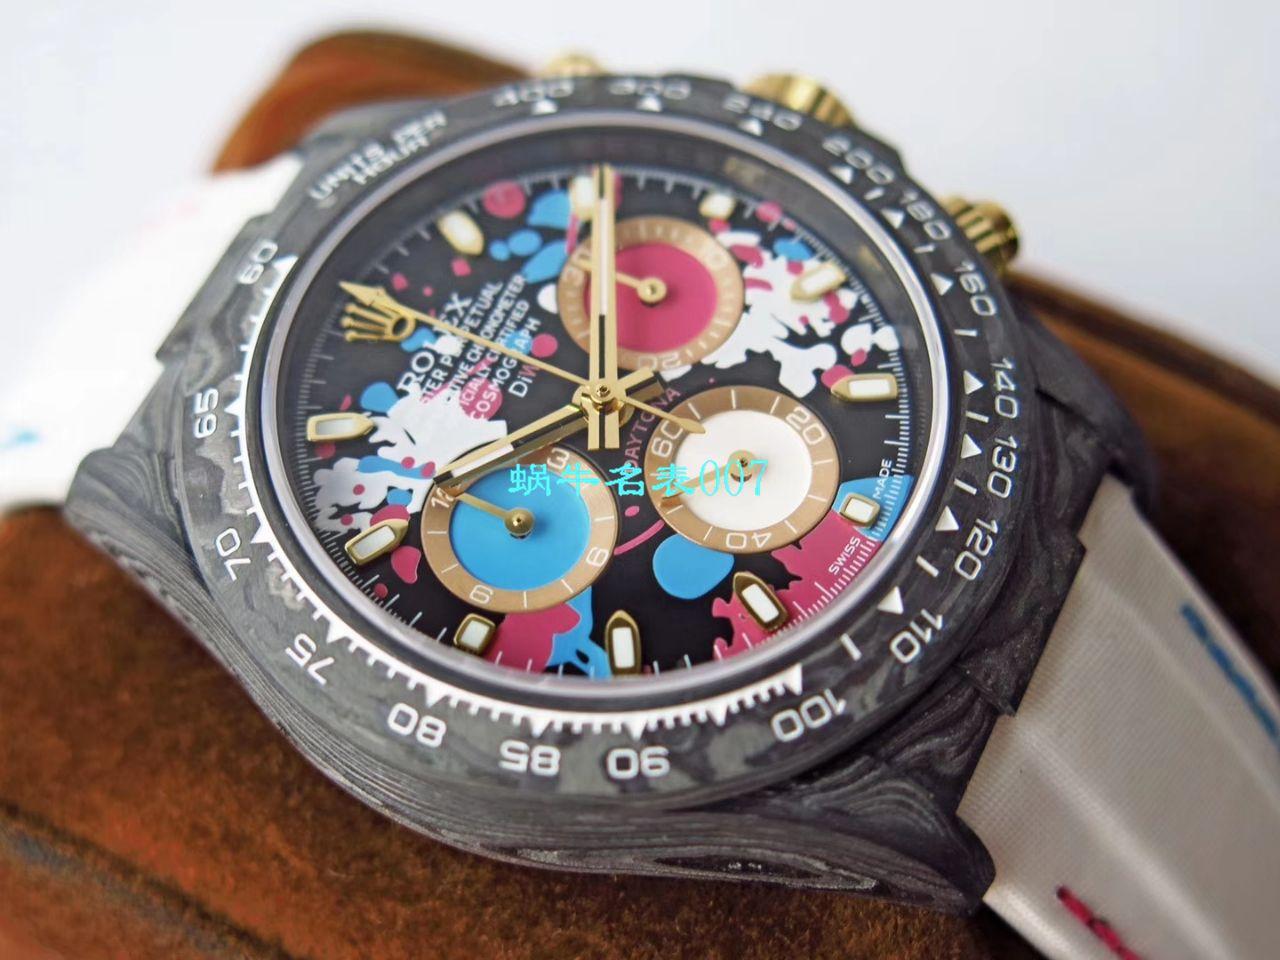 【TW厂劳力士复刻手表】劳力士ROLEX宇宙计时迪通拿系列之全碳纤维海外定制版 / R367